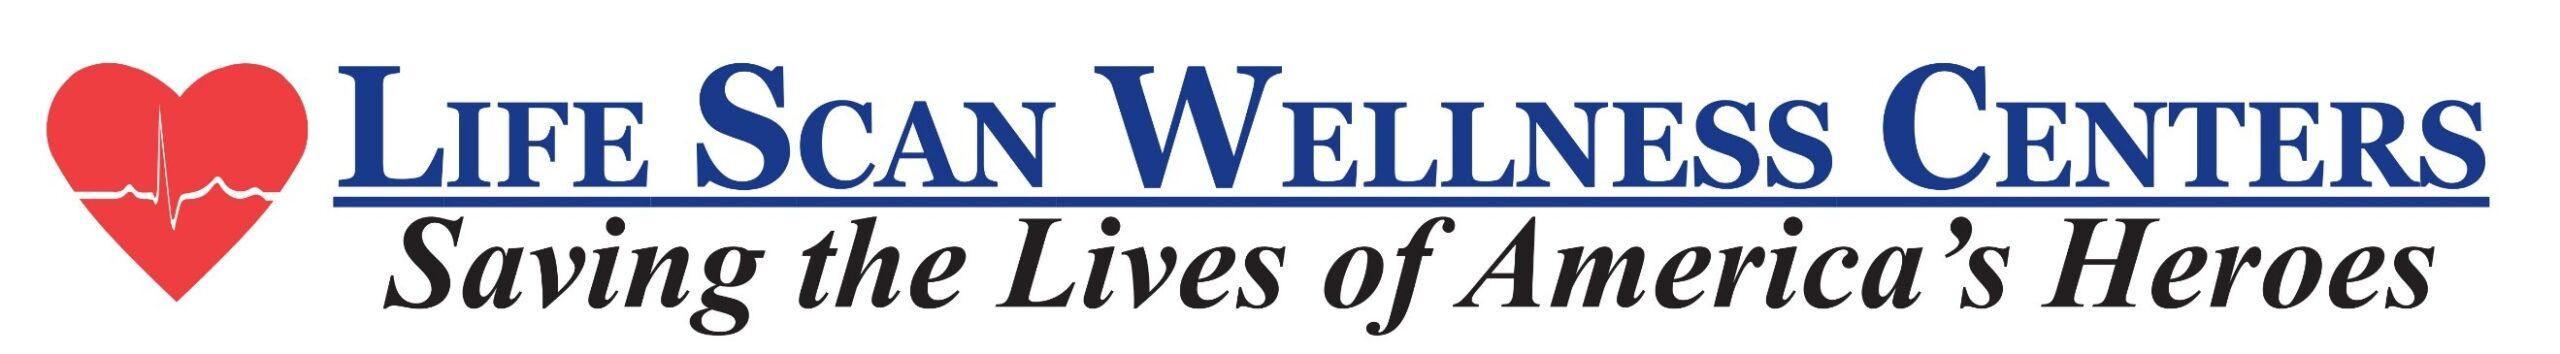 Life Scan Wellness